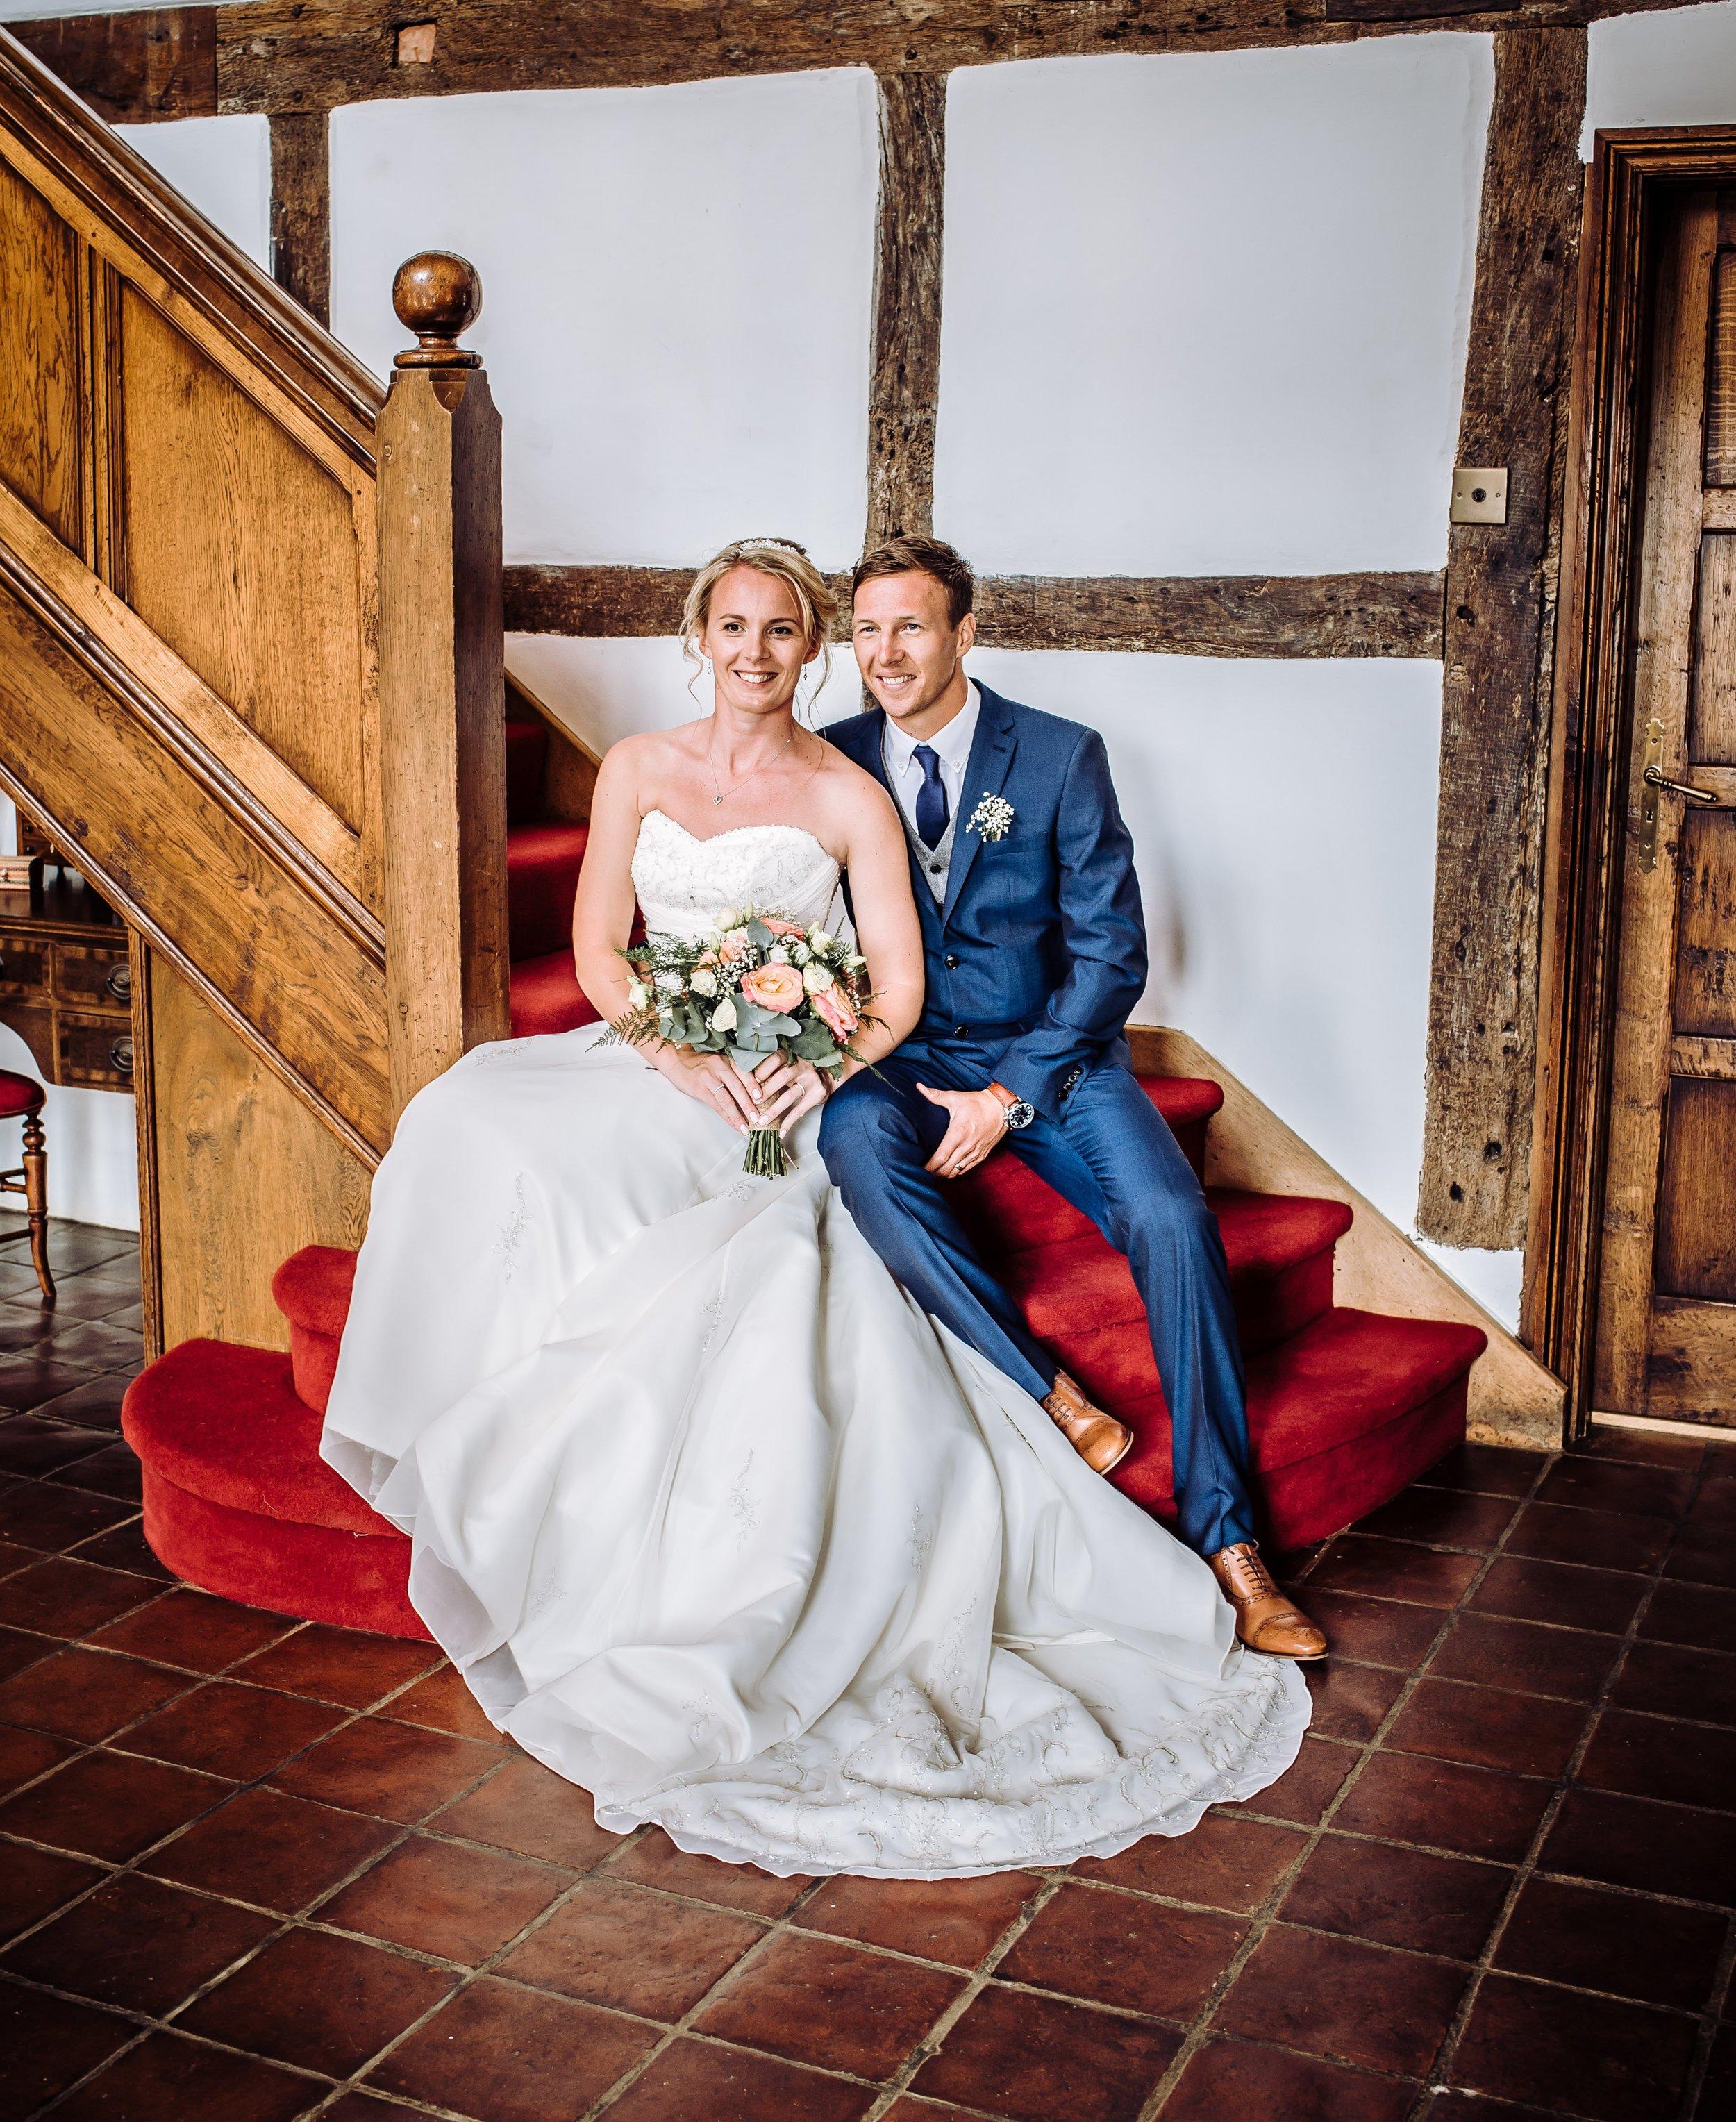 Vintage Wedding - East Sussex Wedding Photographer_0066.jpg